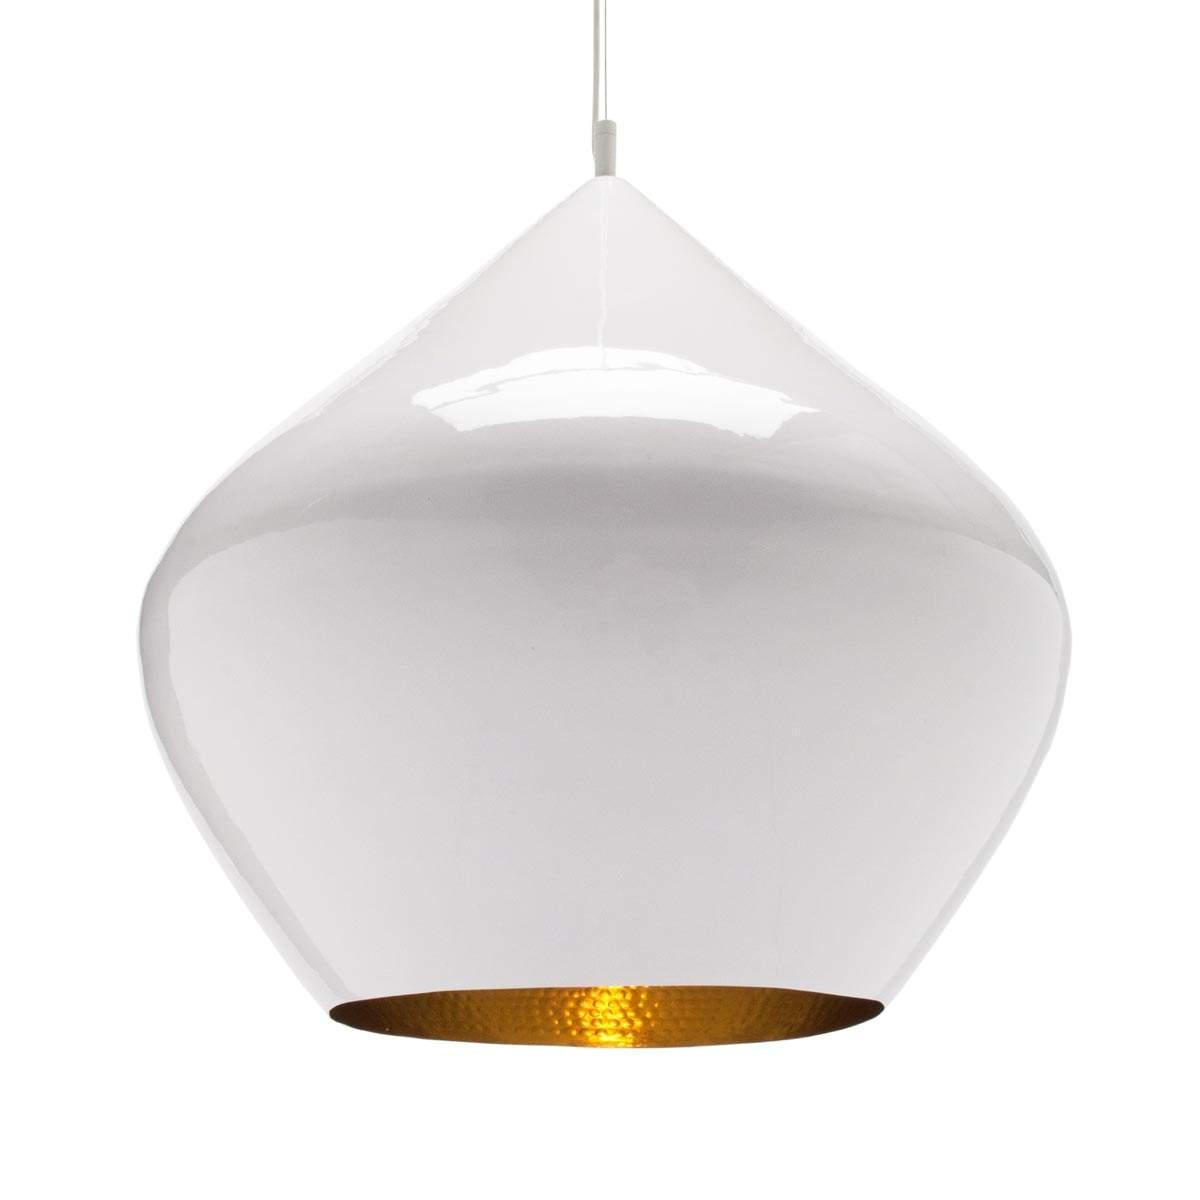 Beat Stout – lampada a sospensione bianco lucido Illuminazione per interni